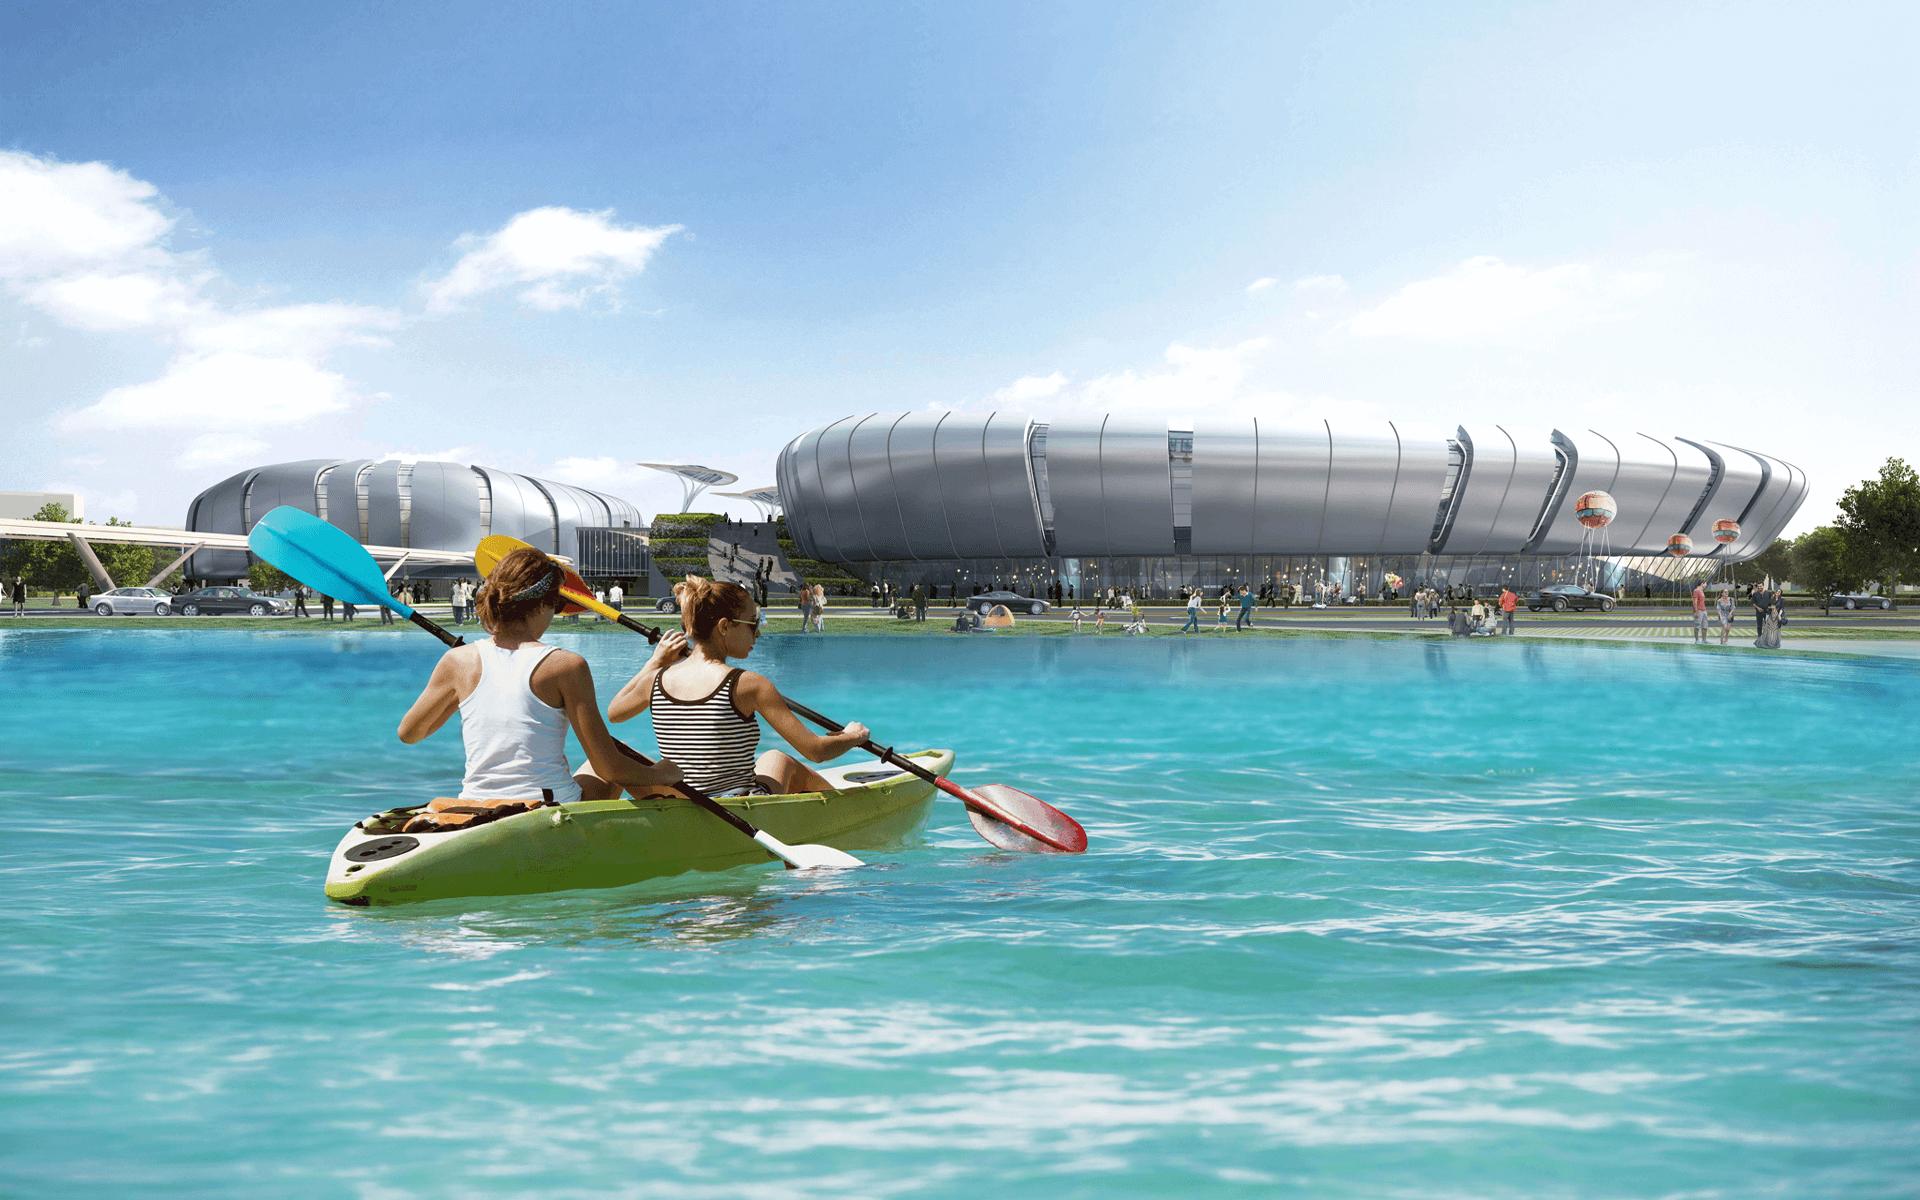 Thể thao Saigon Sports City quận 2 - Căn hộ Velona Keppel Land.